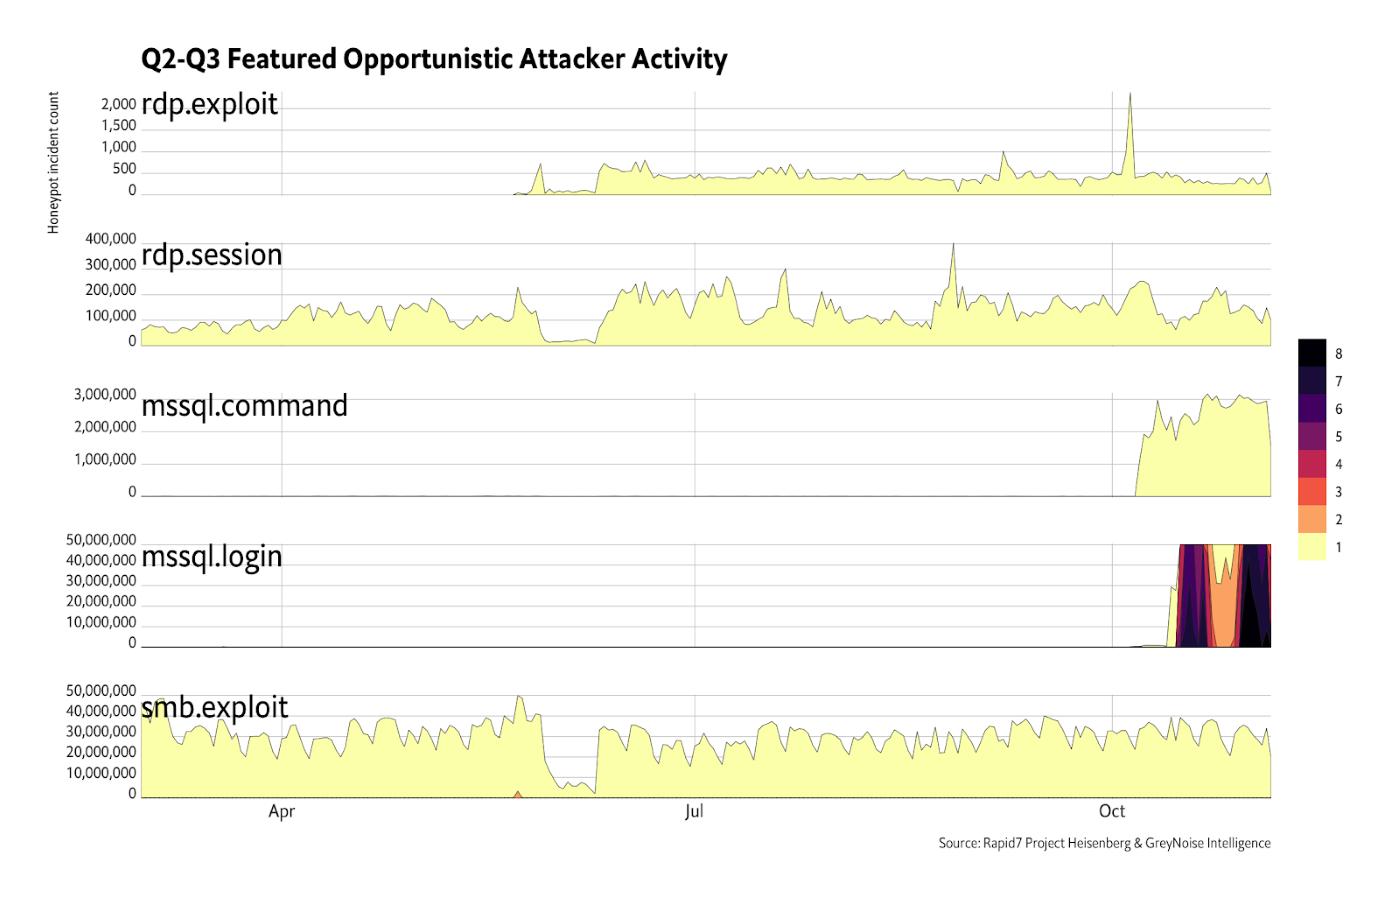 Figure 10: Q2-Q3 Featured Opportunistic Attacker Activity